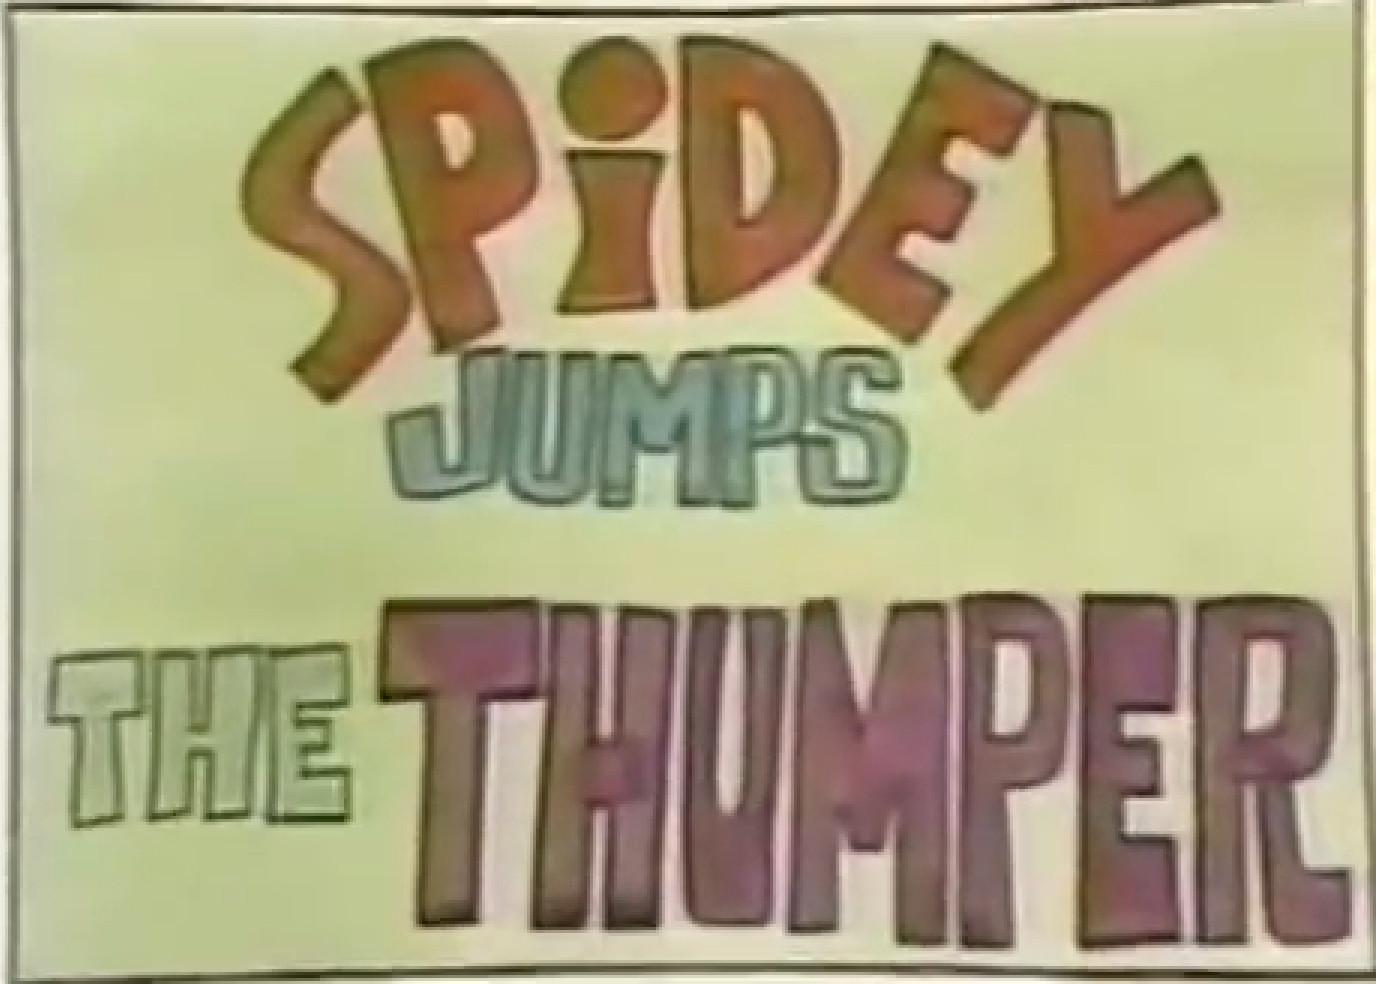 Spidey Super Stories (TV series) Season 1 9